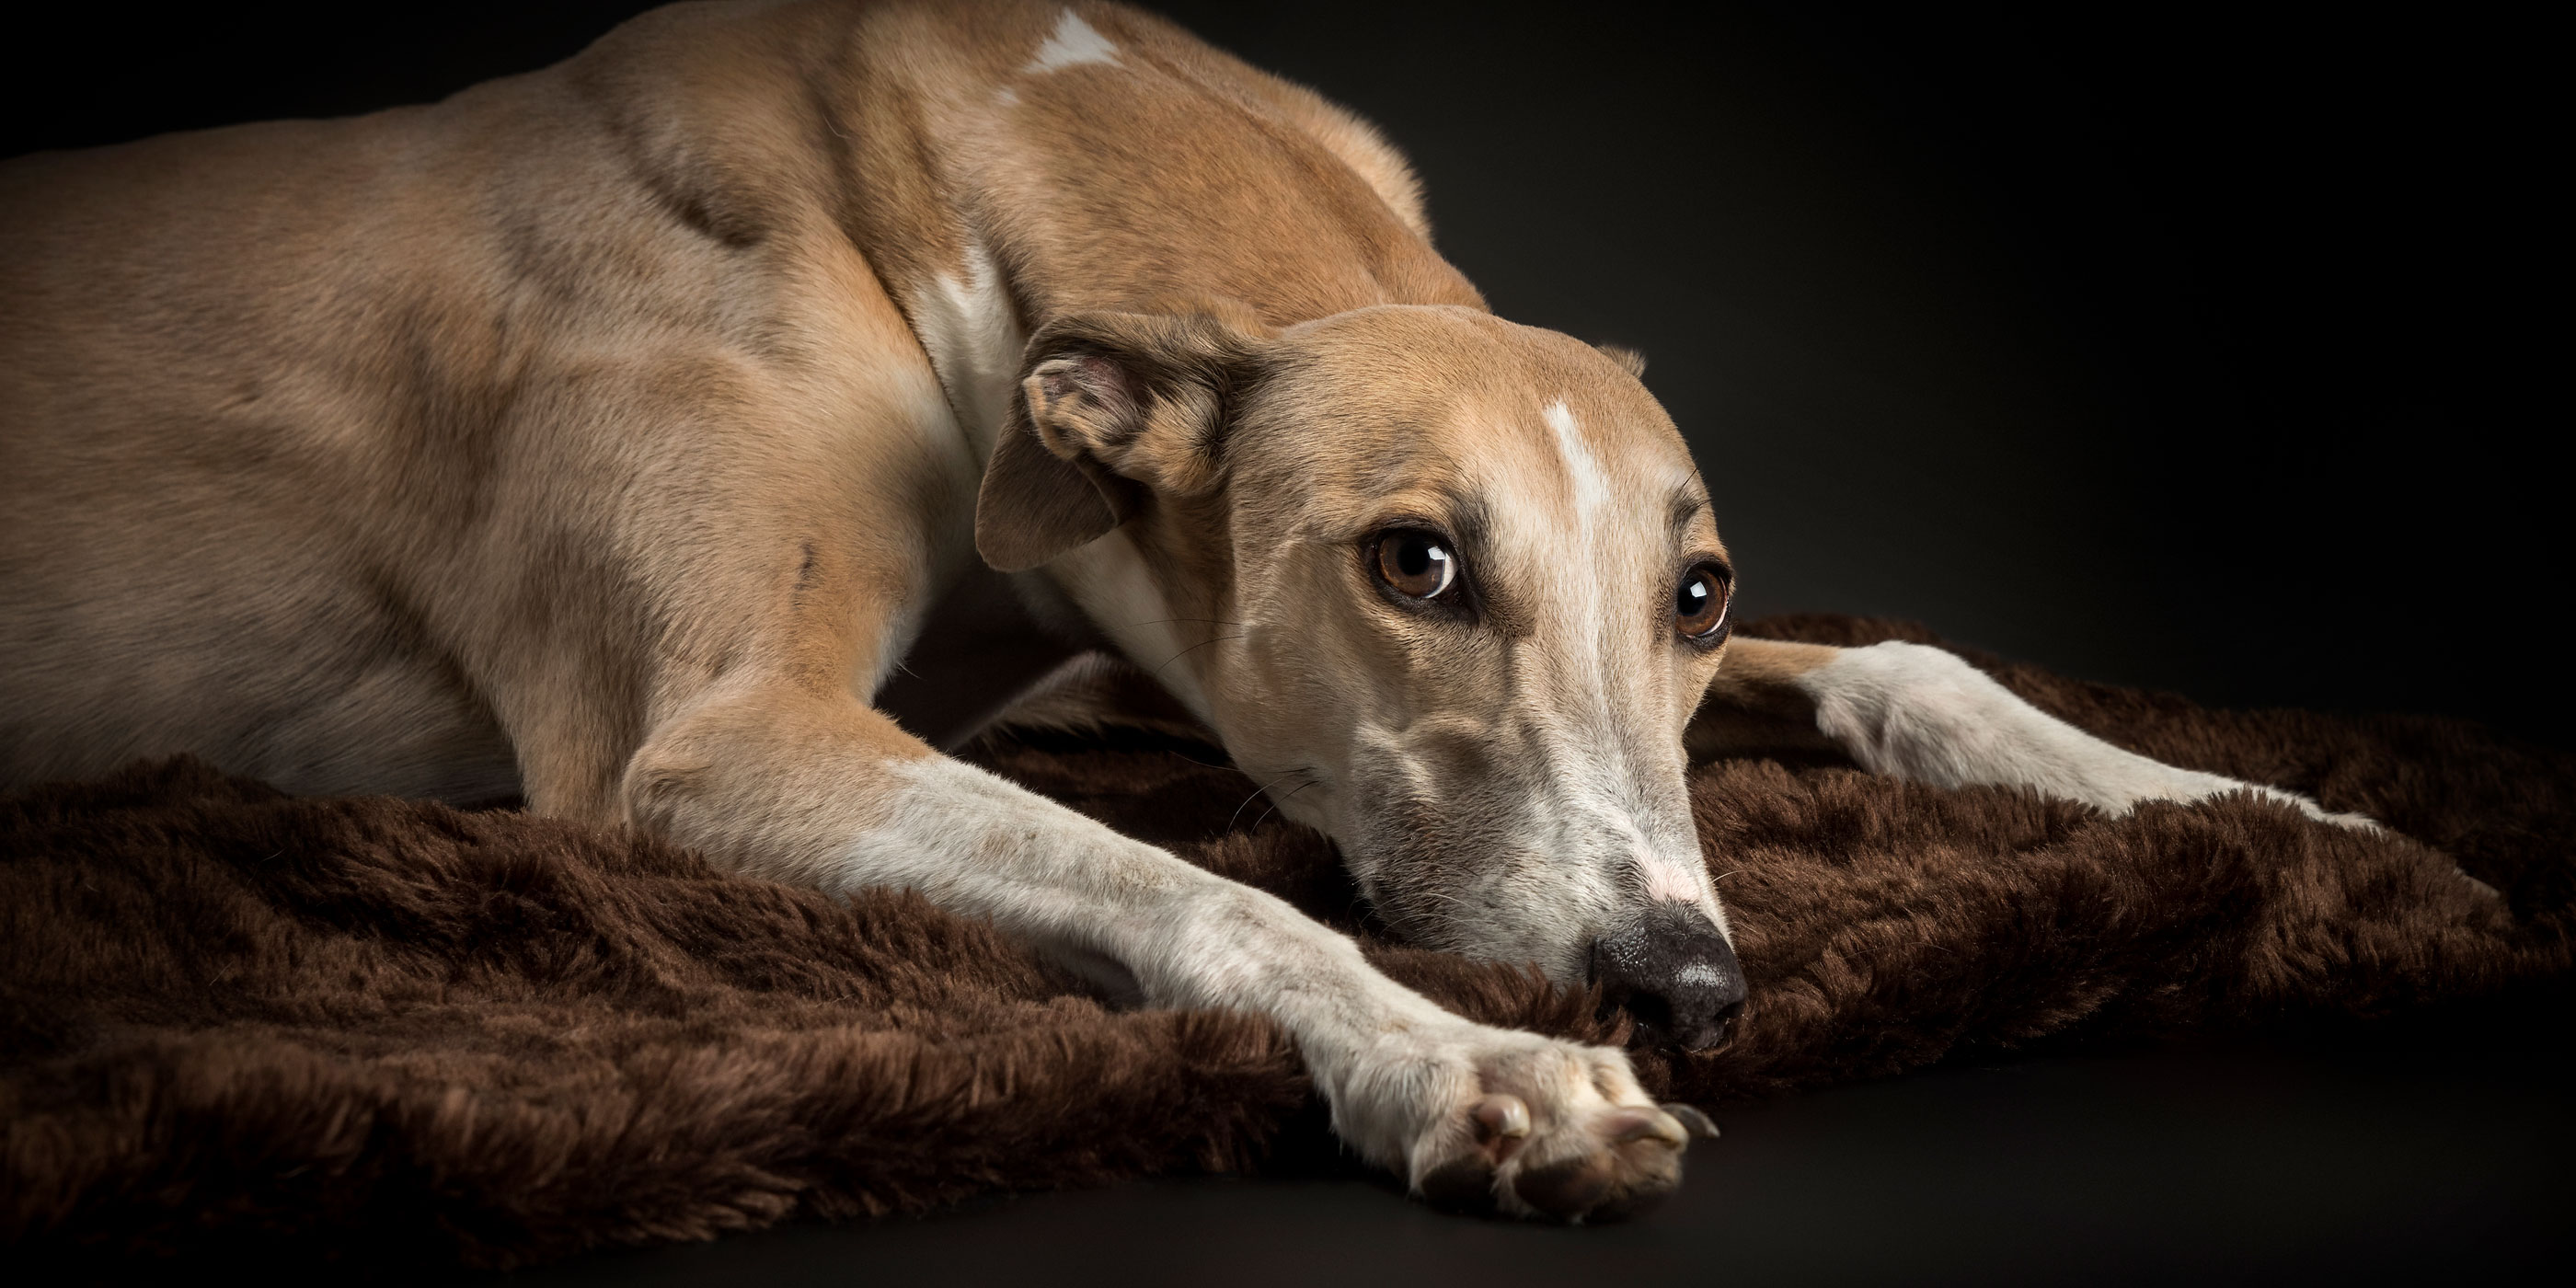 greyhound lying on brown blanket